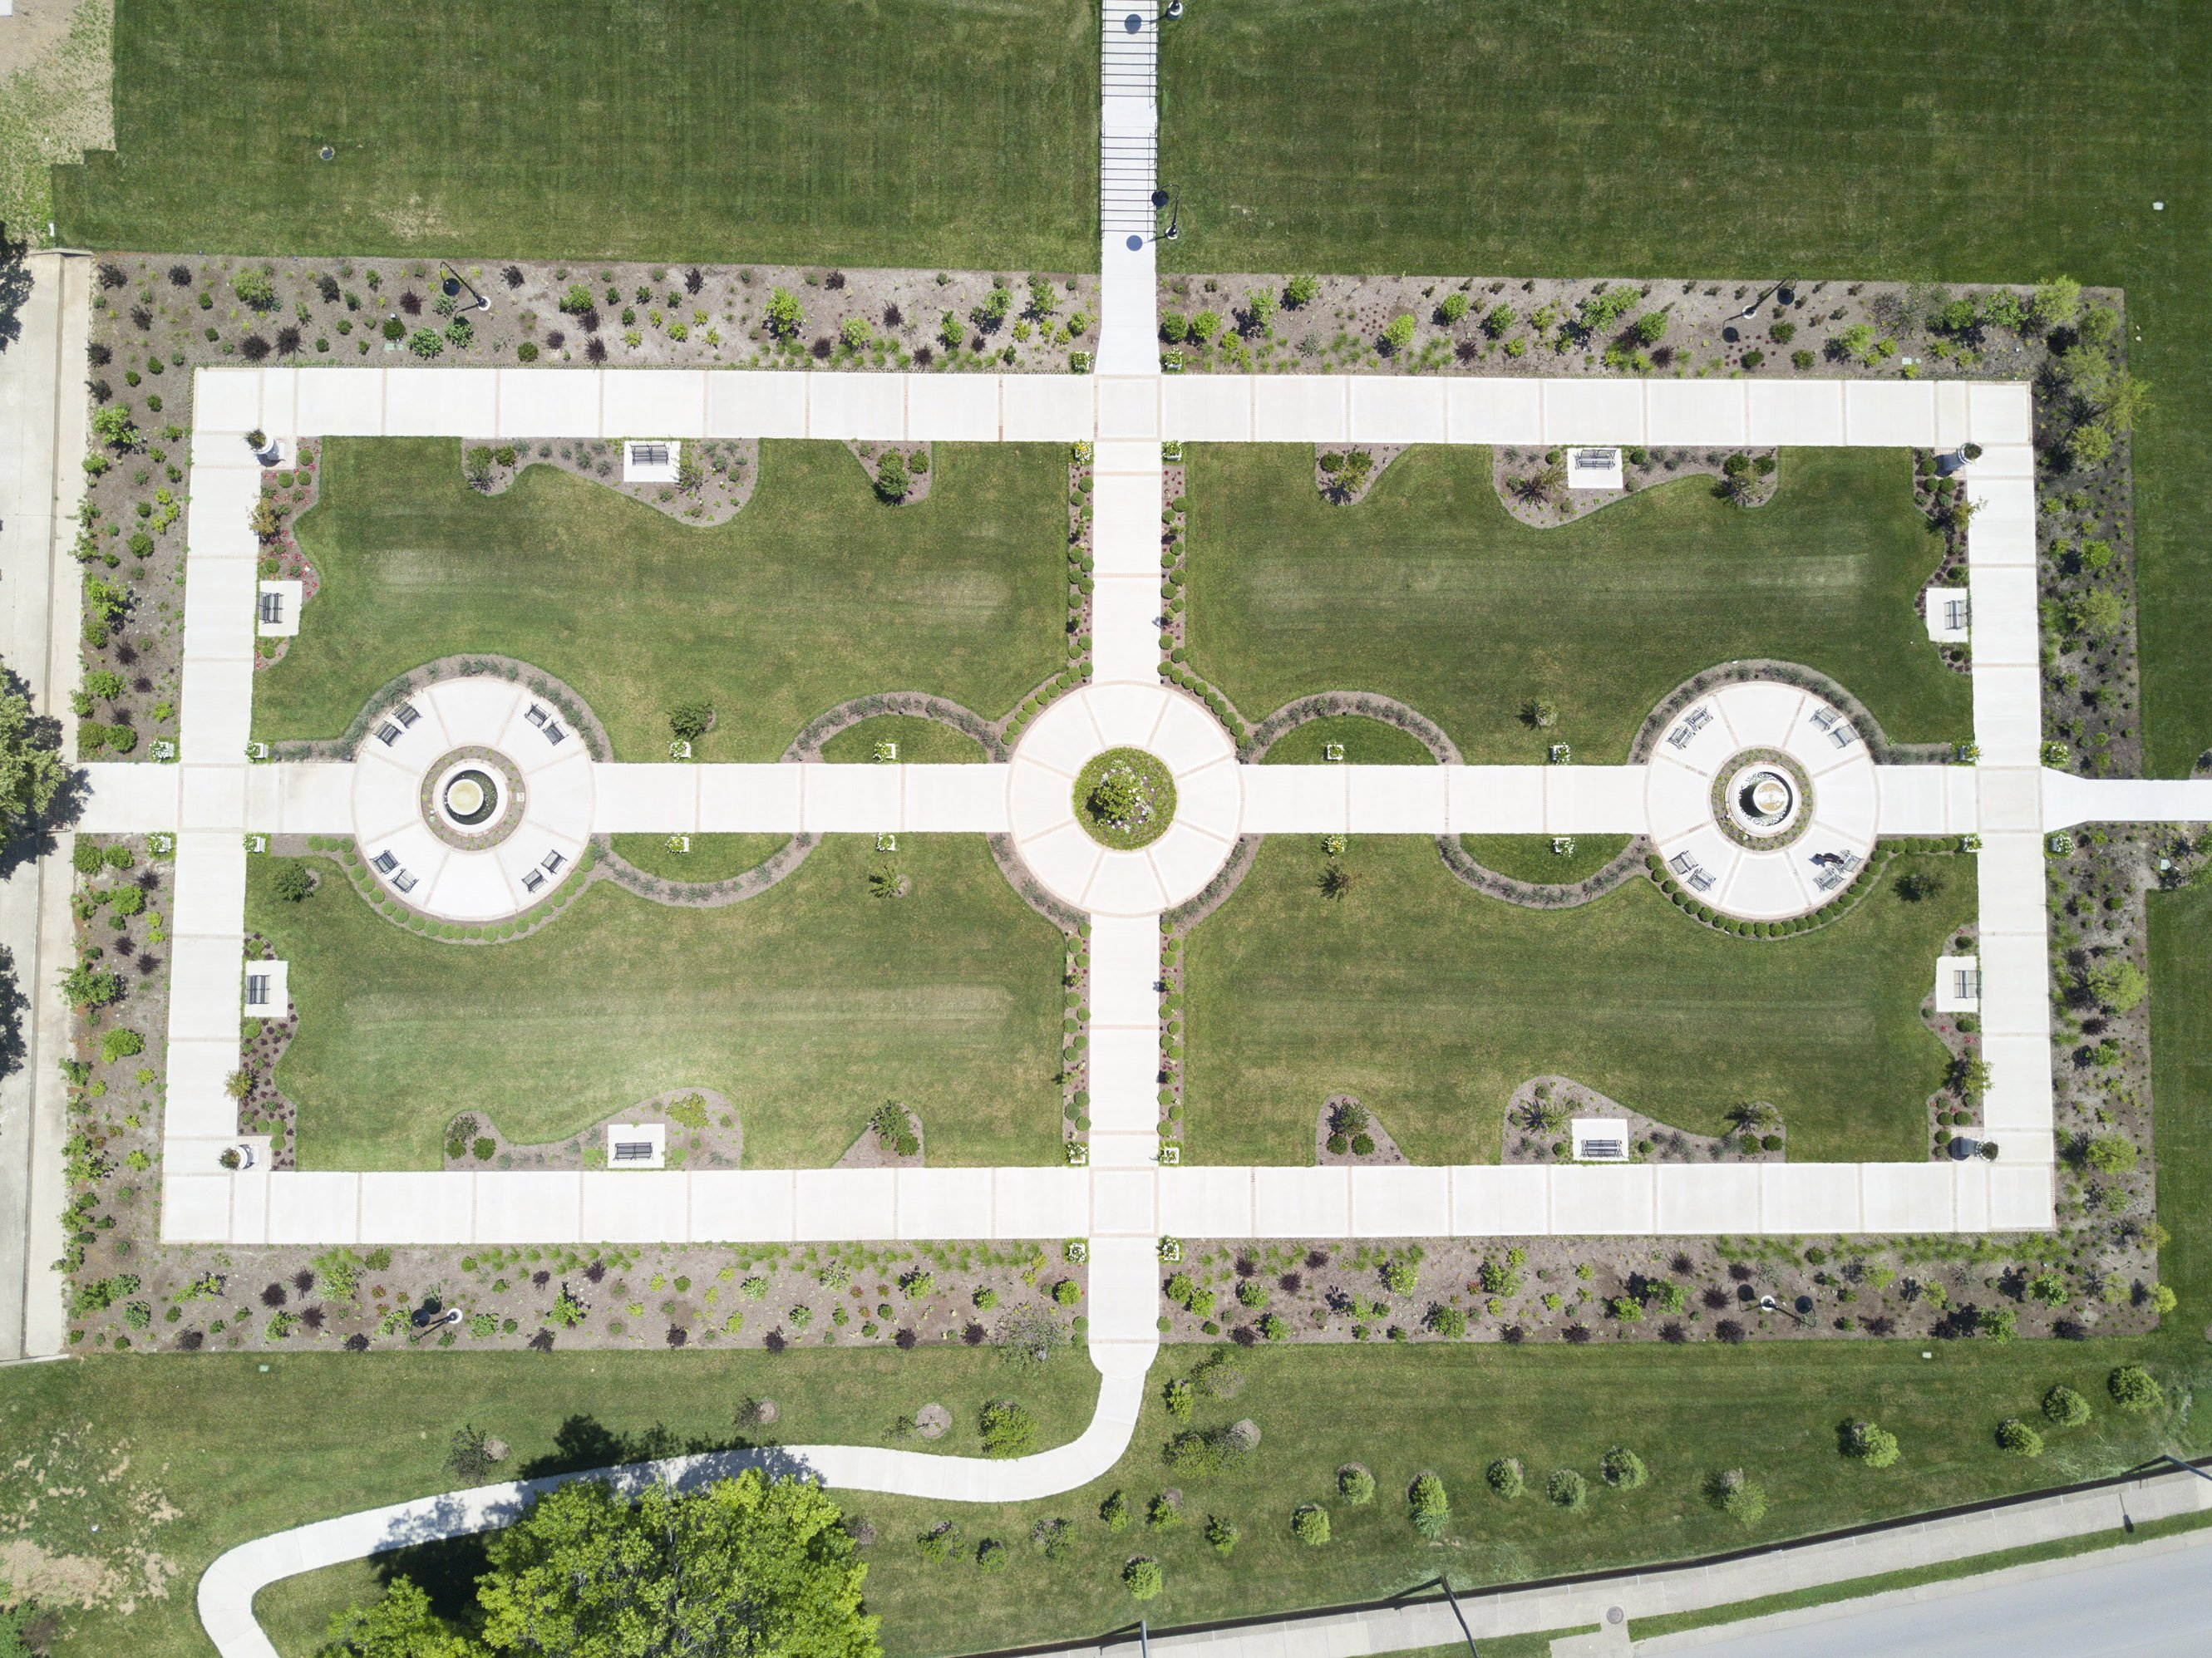 Aerial view of Carloftis Garden